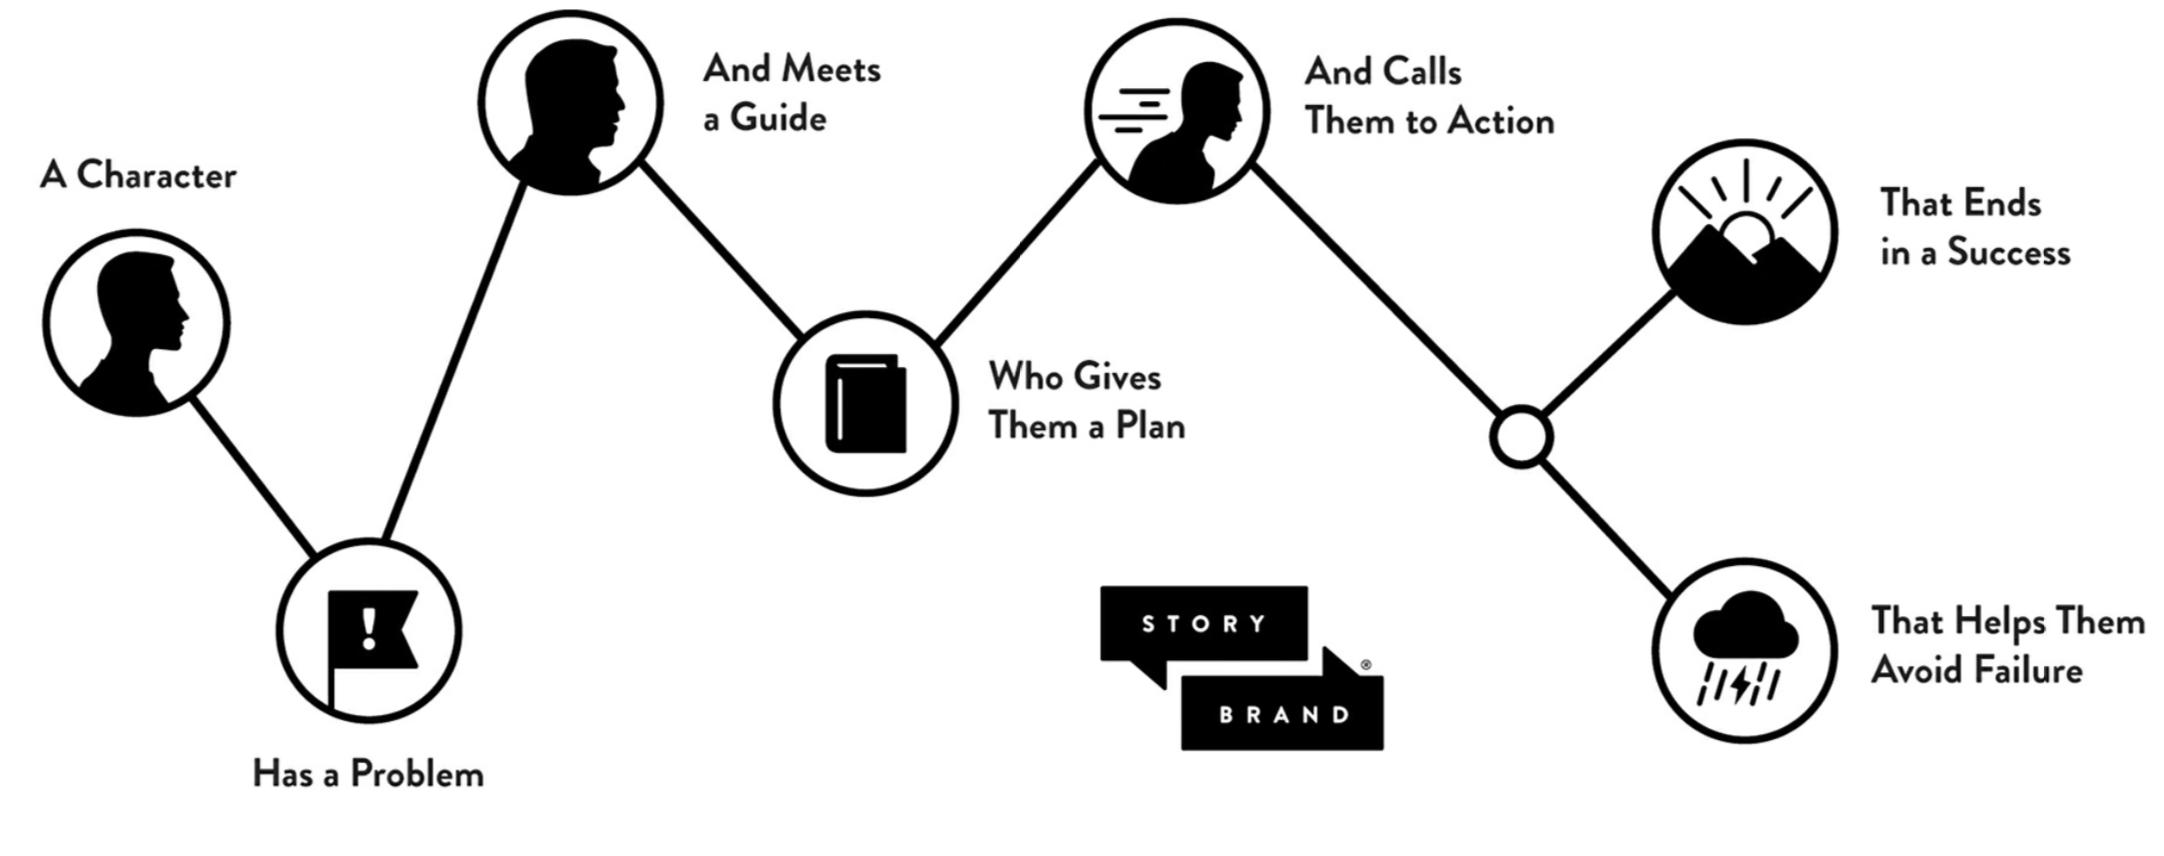 brand story framework by Donald Miller